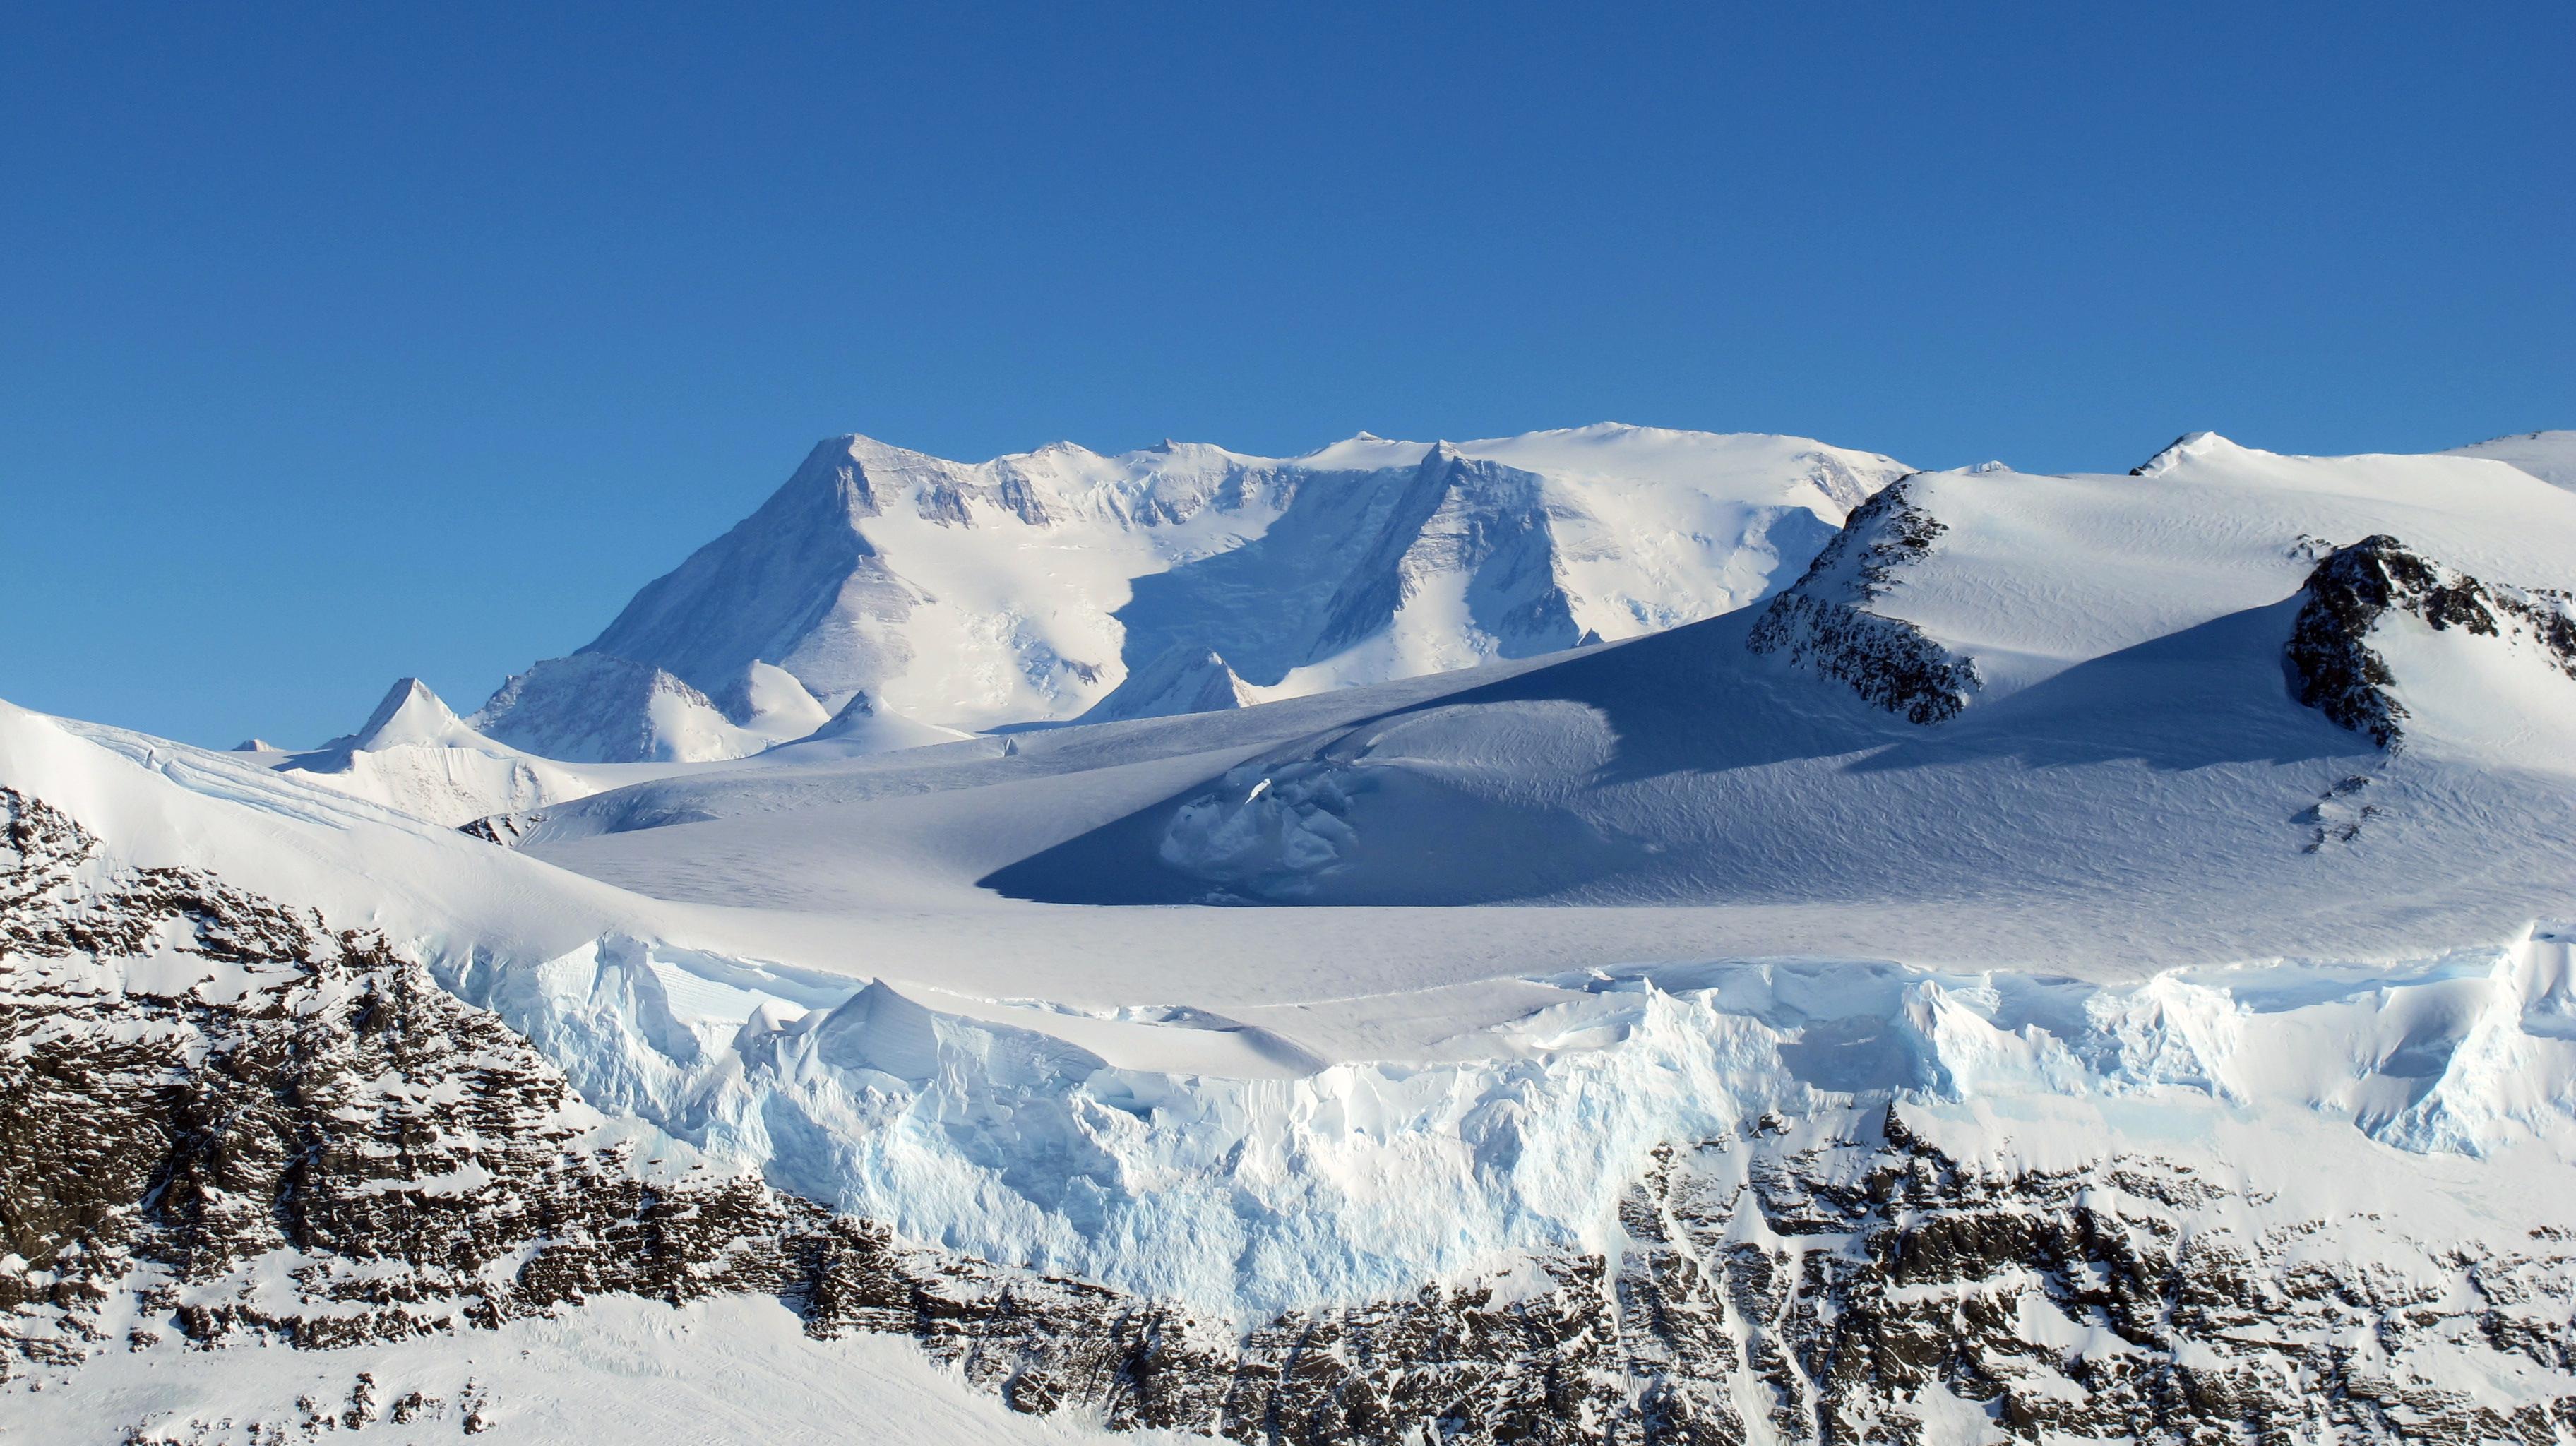 Ellsworth mountains, Antarctica.